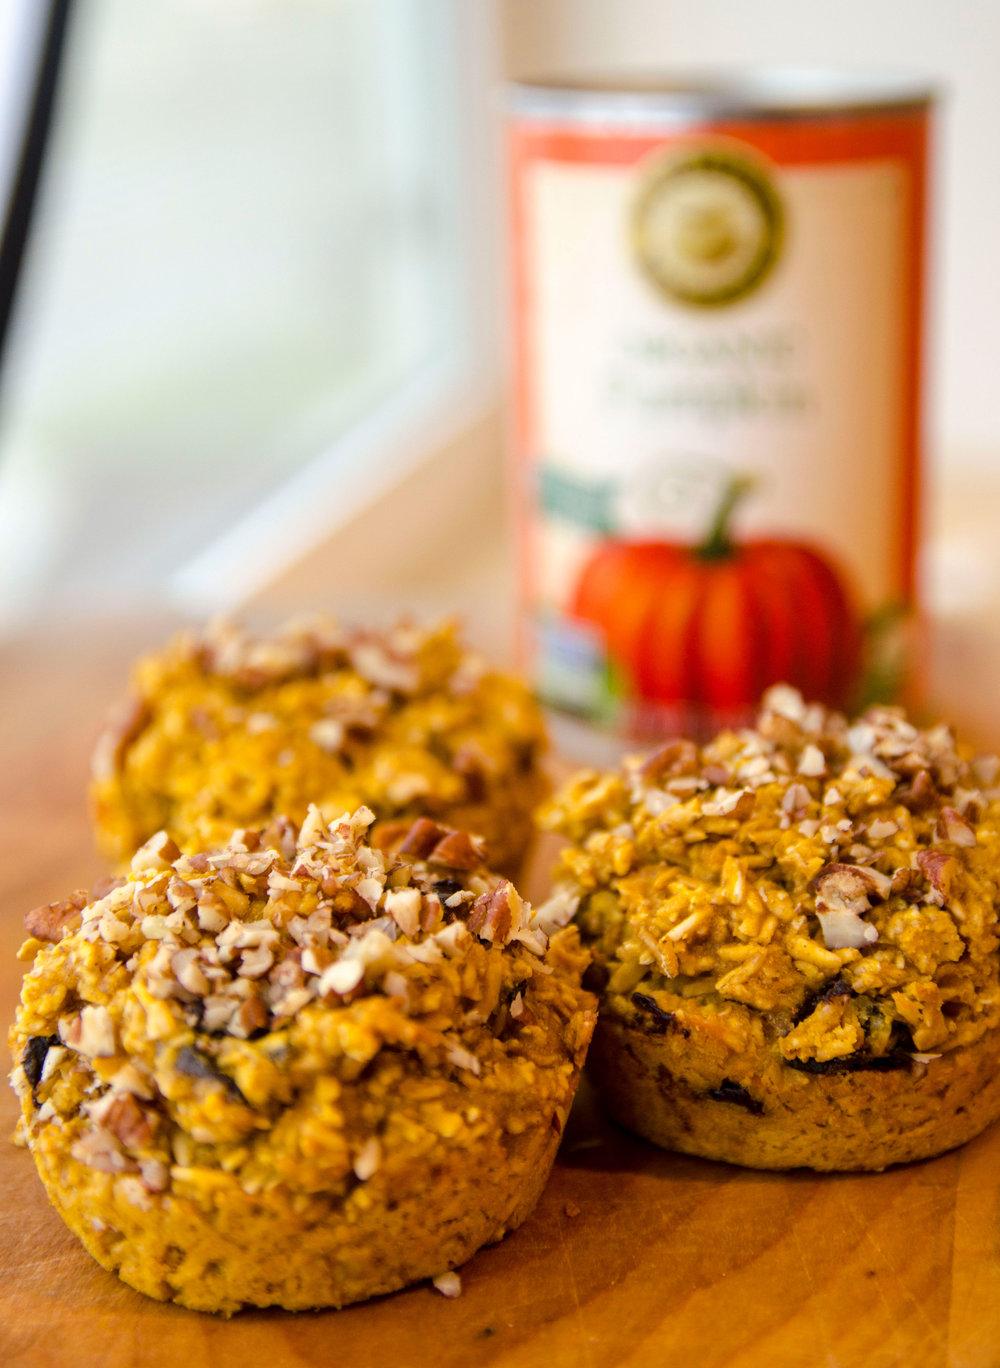 muffinsforweb.jpg